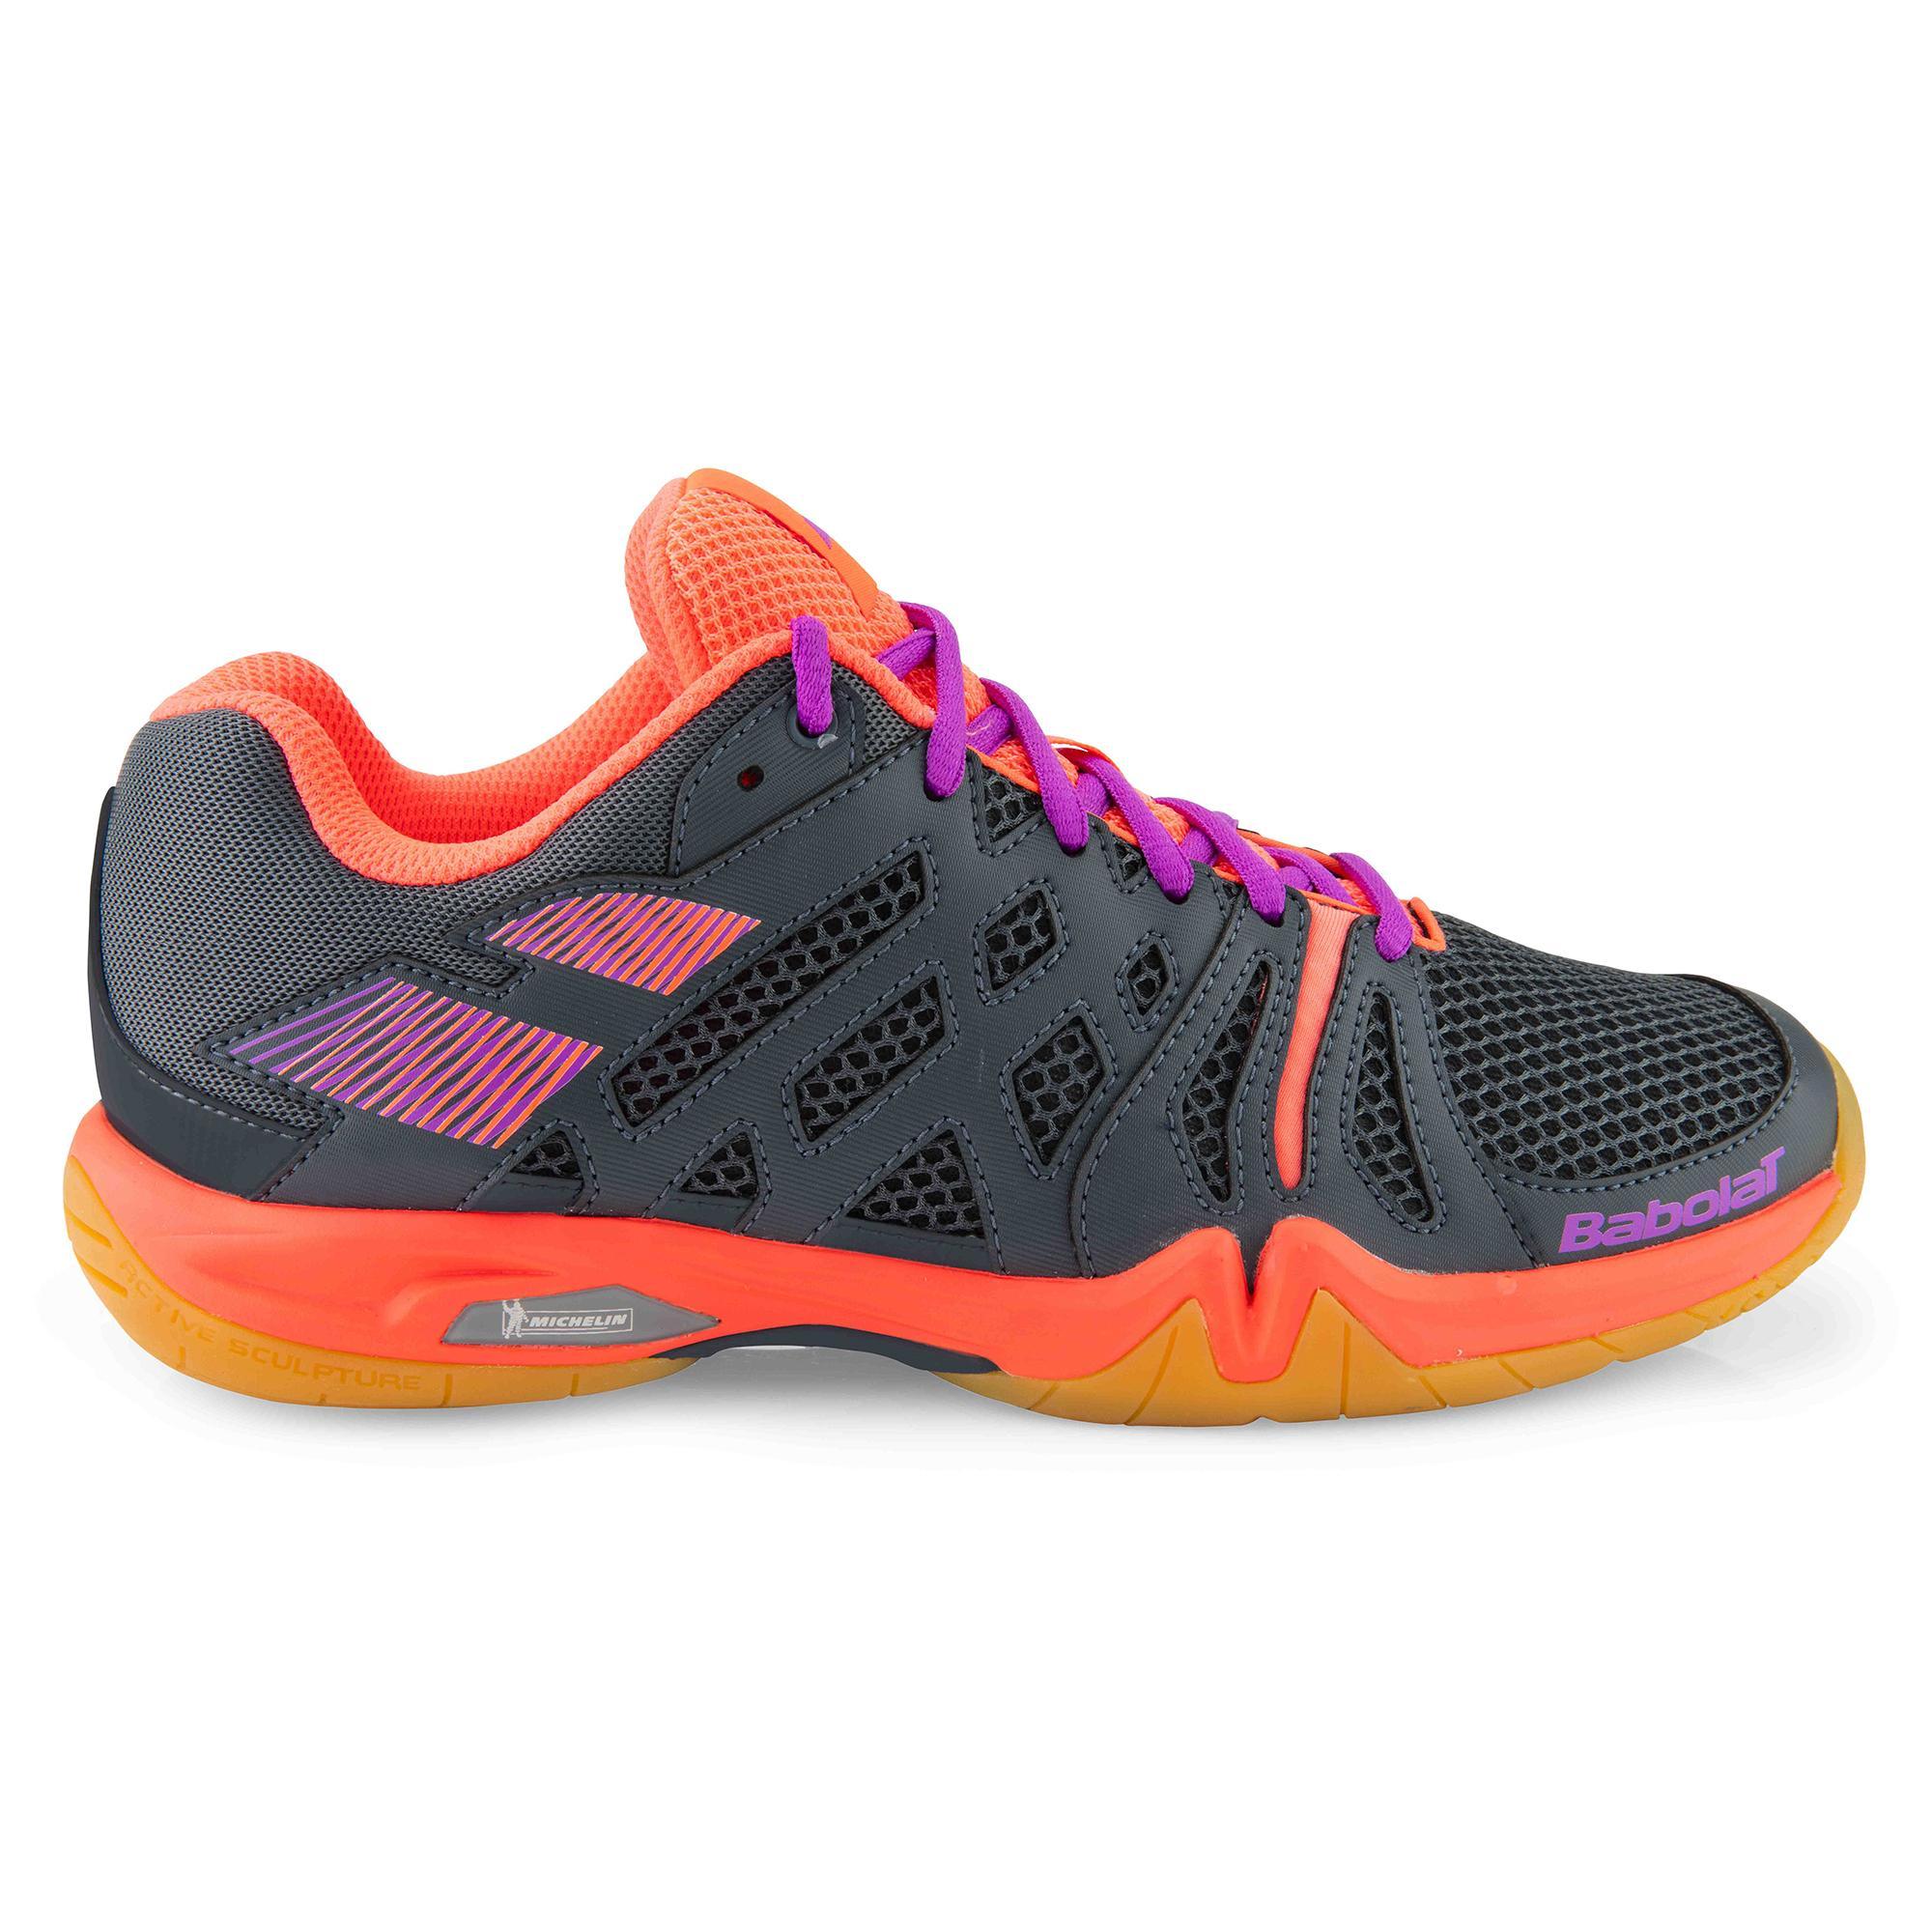 25c003e85a8 Babolat Shadow Team Women s Badminton Shoes (Anthracite Fluorescent Pink)